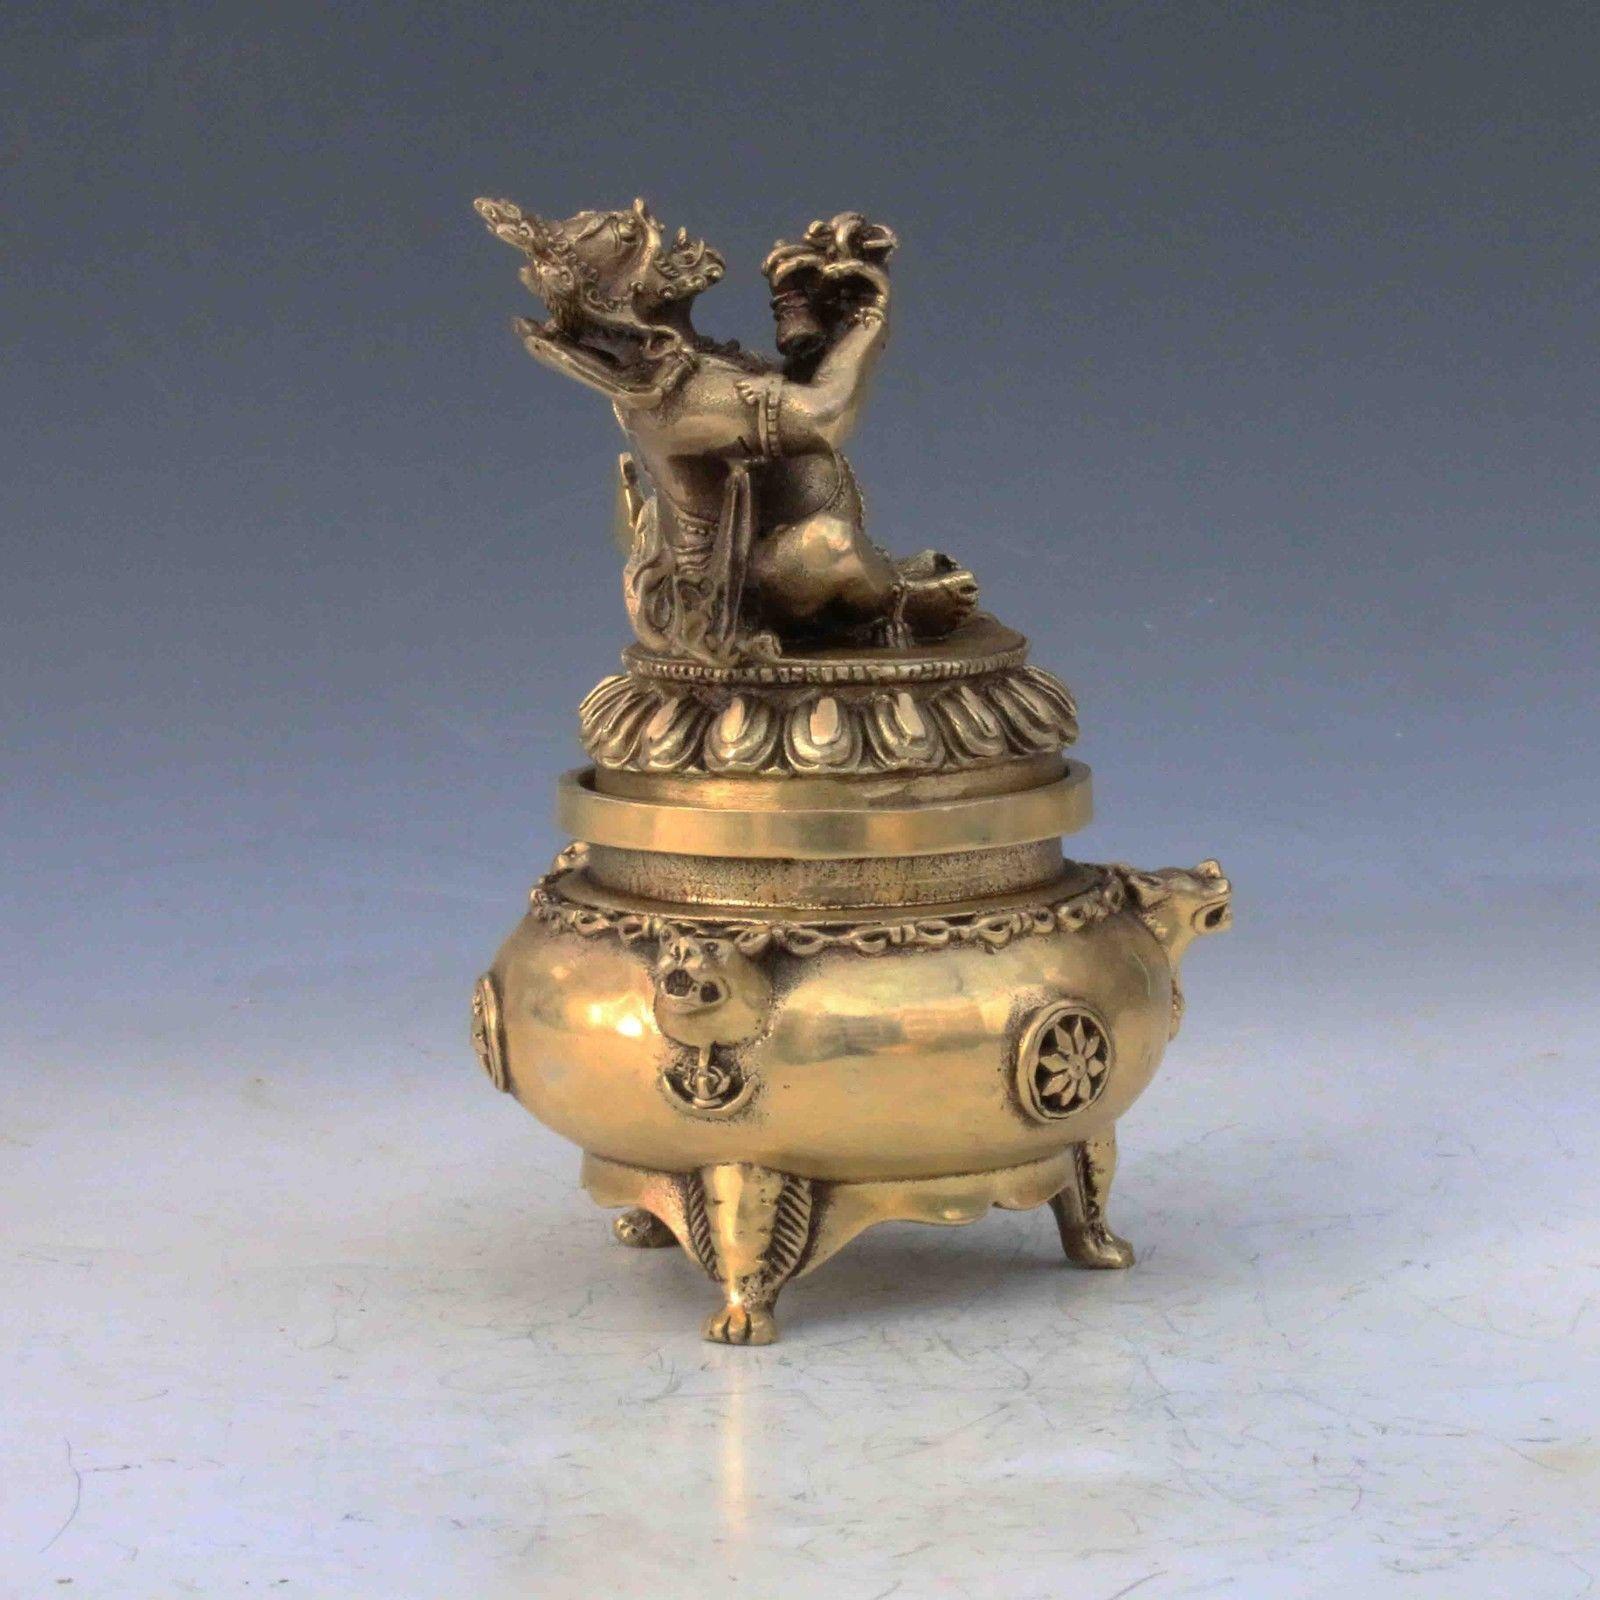 Chinese Brass Handwork Carved God Buddha Incense Burner & Lid M0053